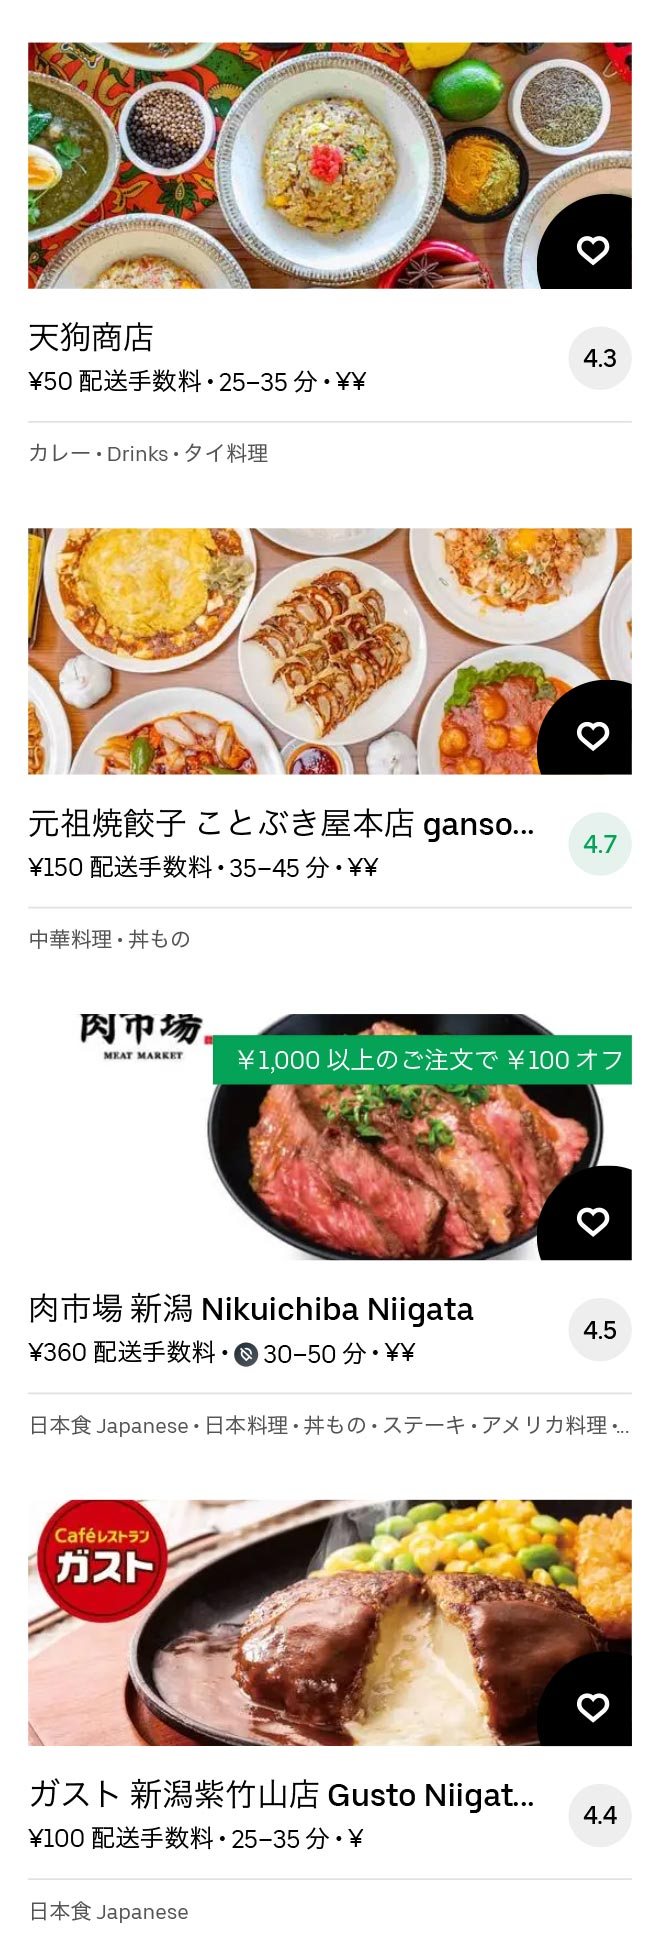 Niigata menu 2011 10